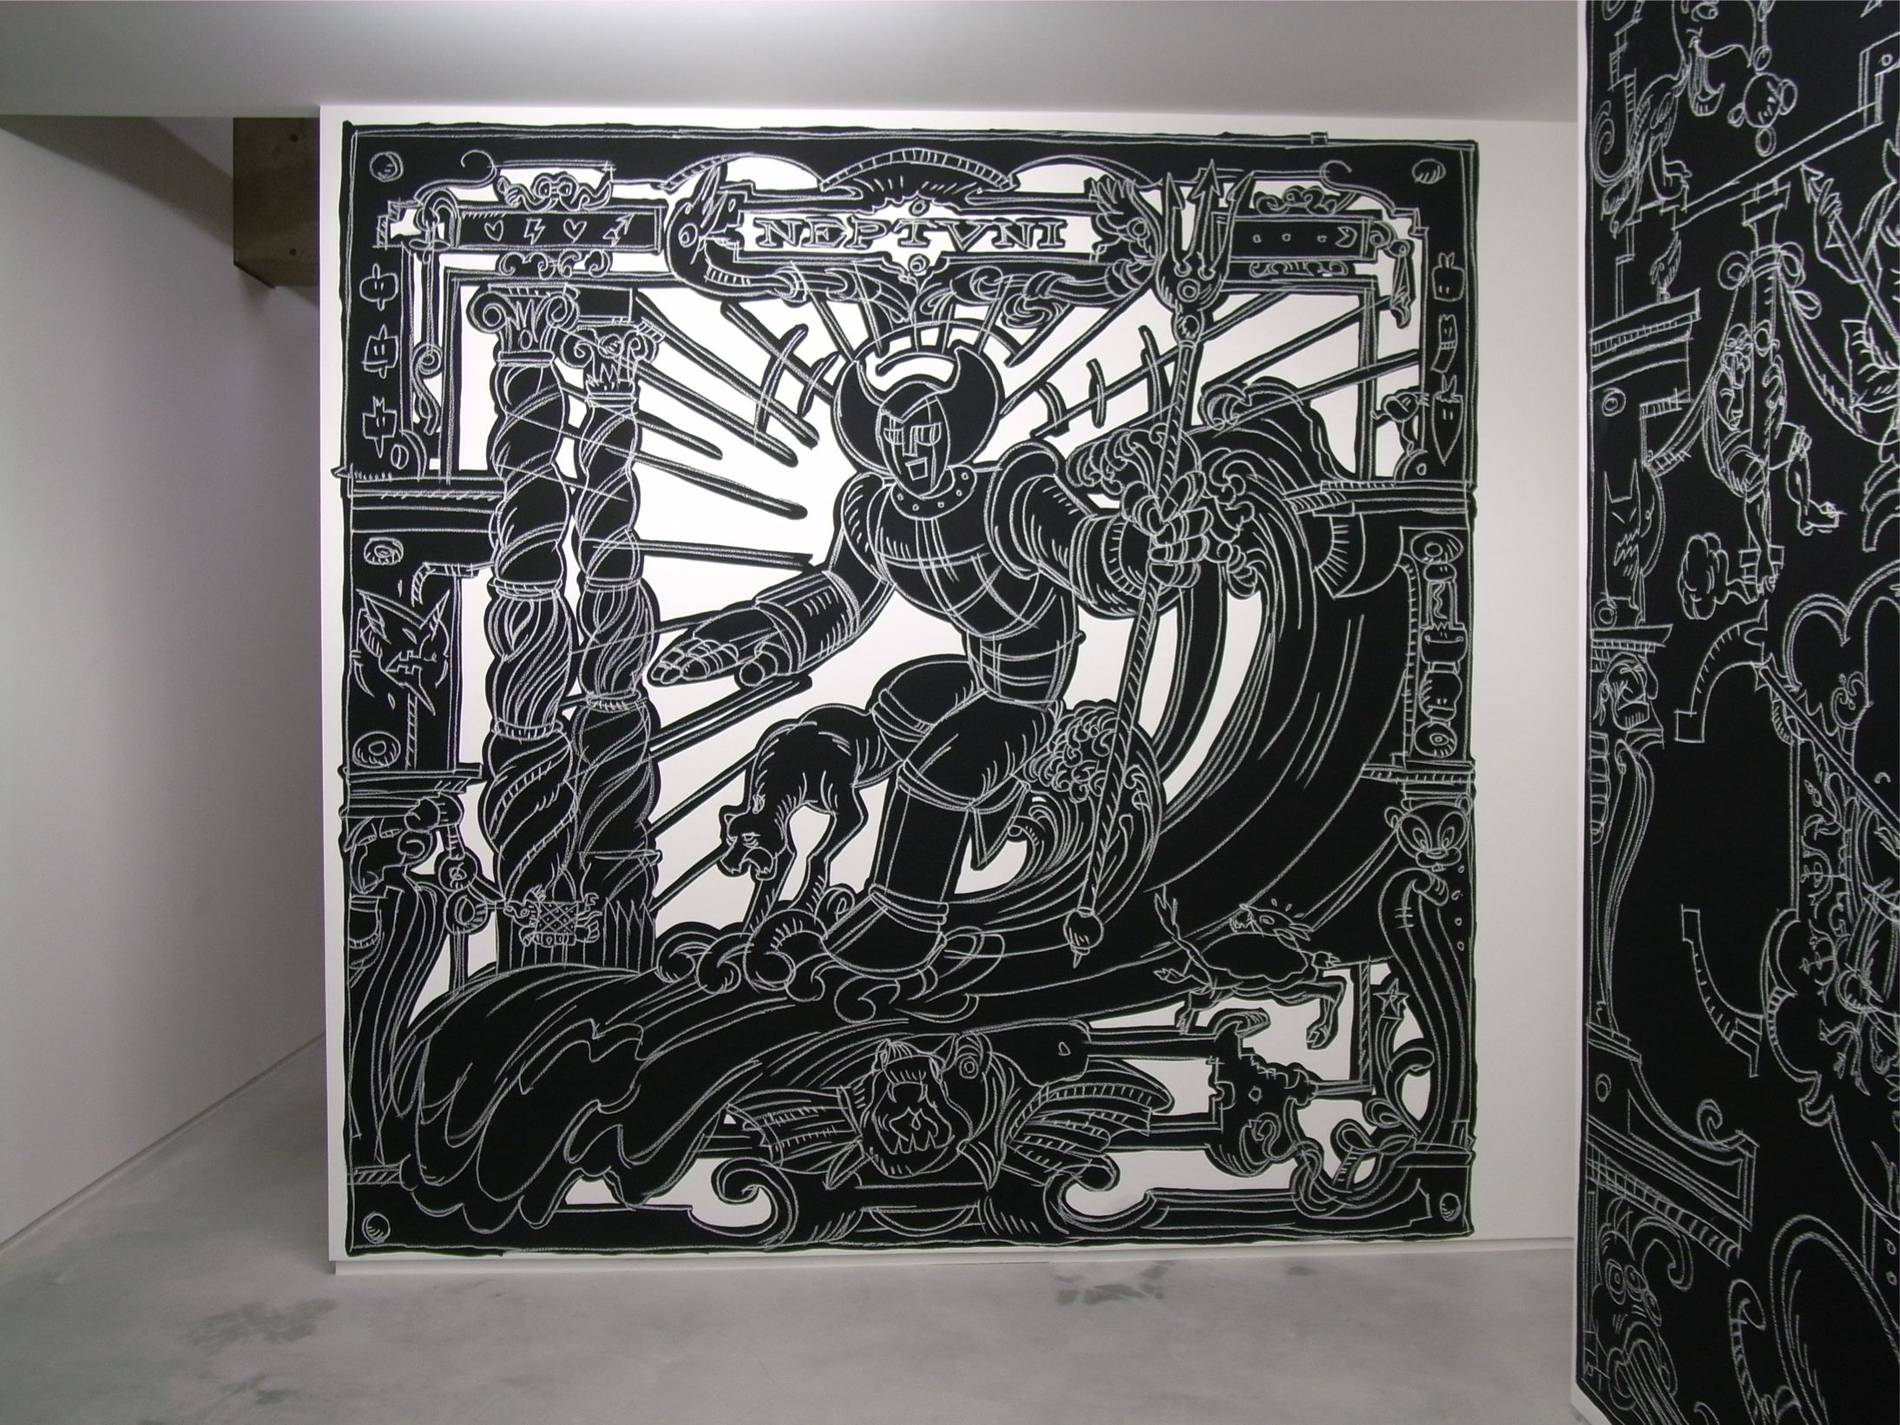 ·: Nicolas Buffe :· - Nicolas Buffe - 2010---01 - La Tour, Megumi Ogita Gallery, 5, wall drawing, chalk, paint-mini